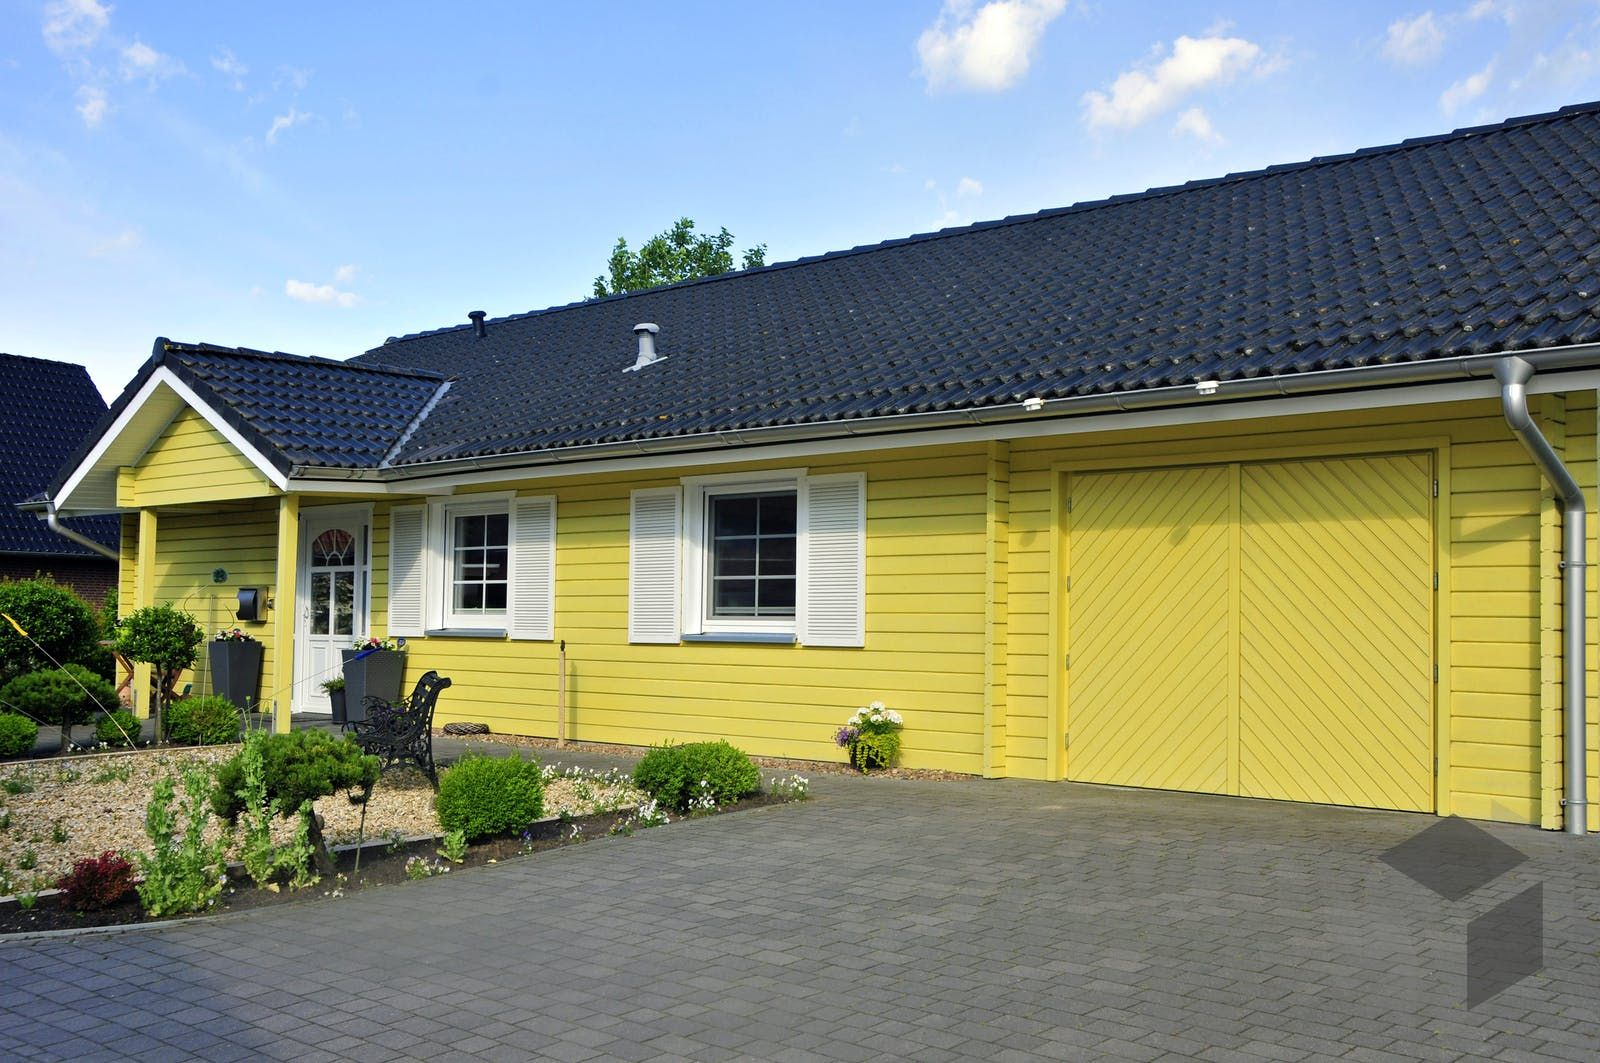 Bungalow Mit Garage Im Haus In 2020 Holzhaus Bungalow Haus Haus Mit Garage